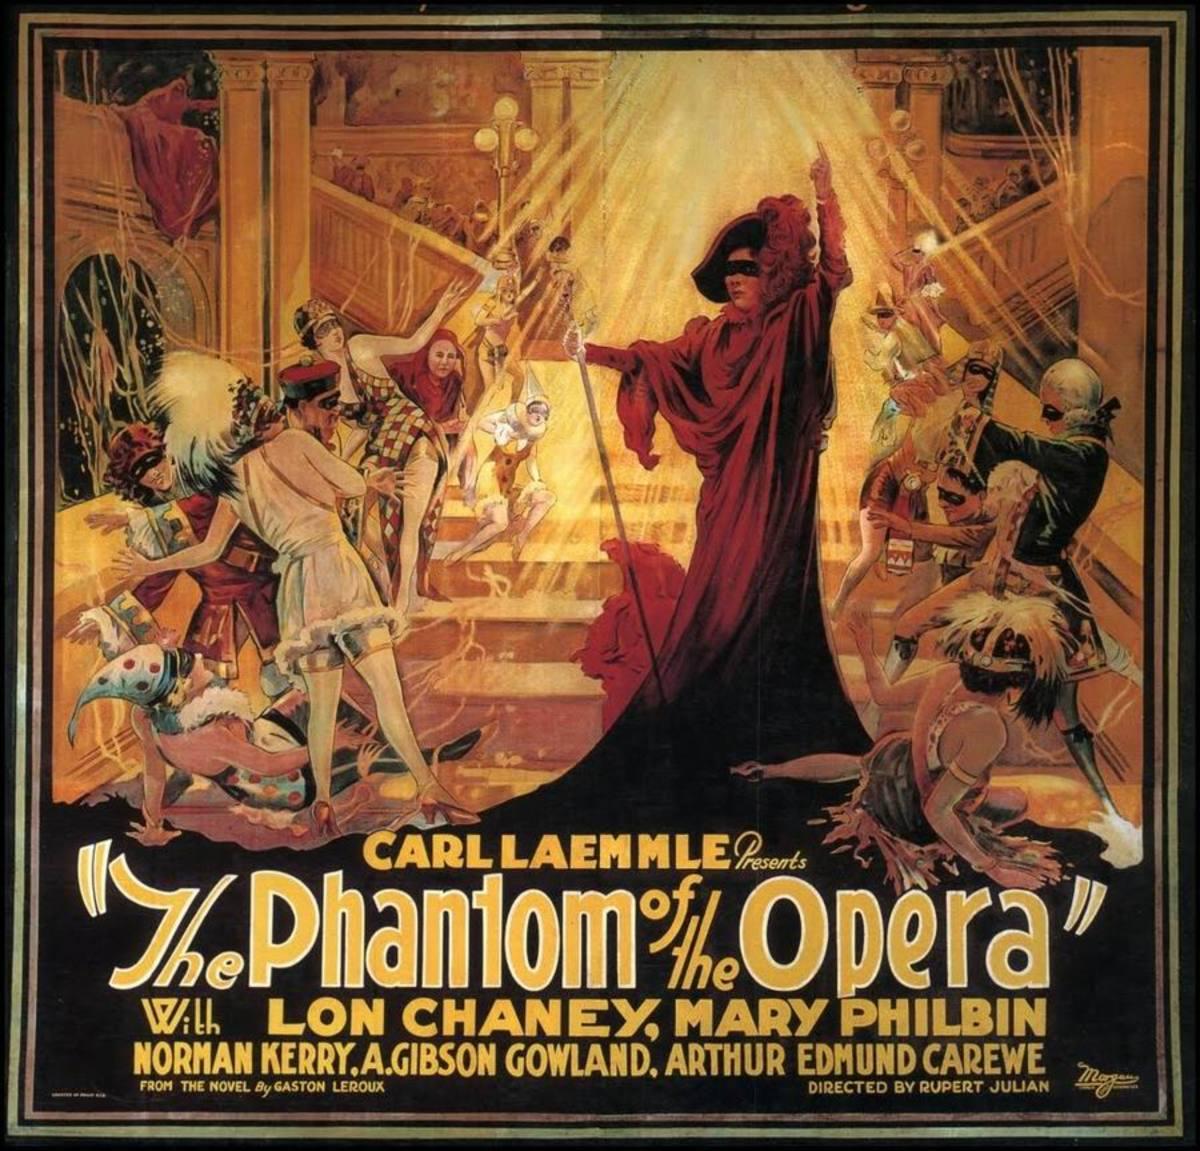 The Phantom of the Opera - on the Screen